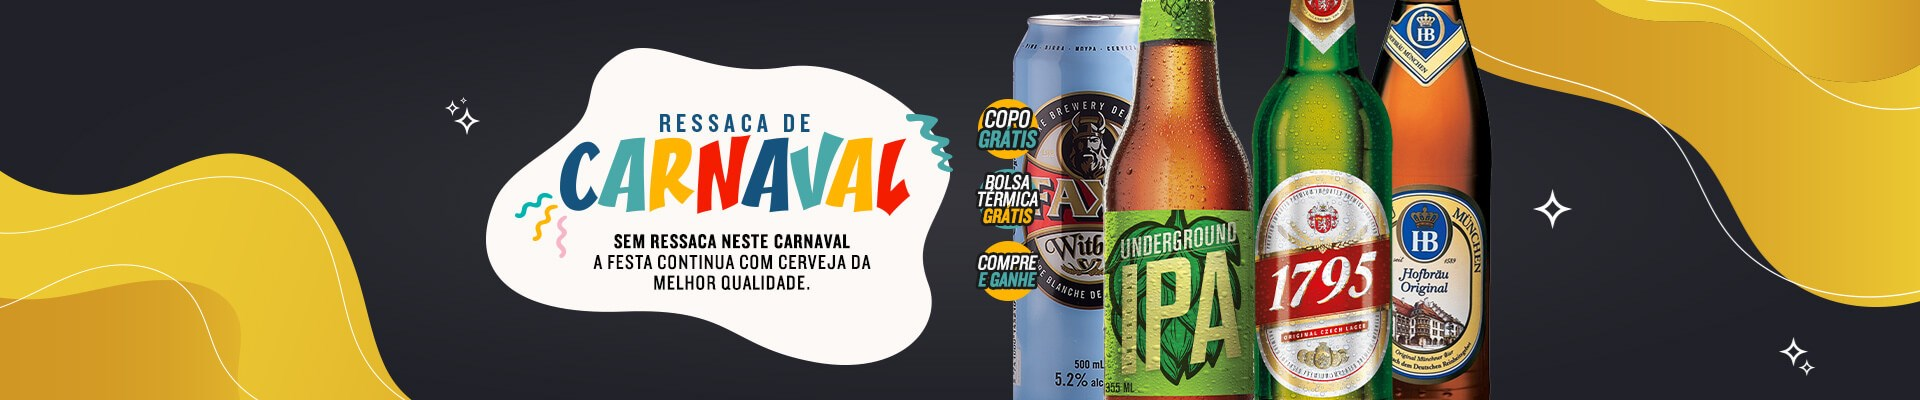 Ressaca de Carnaval - Dpto Desktop